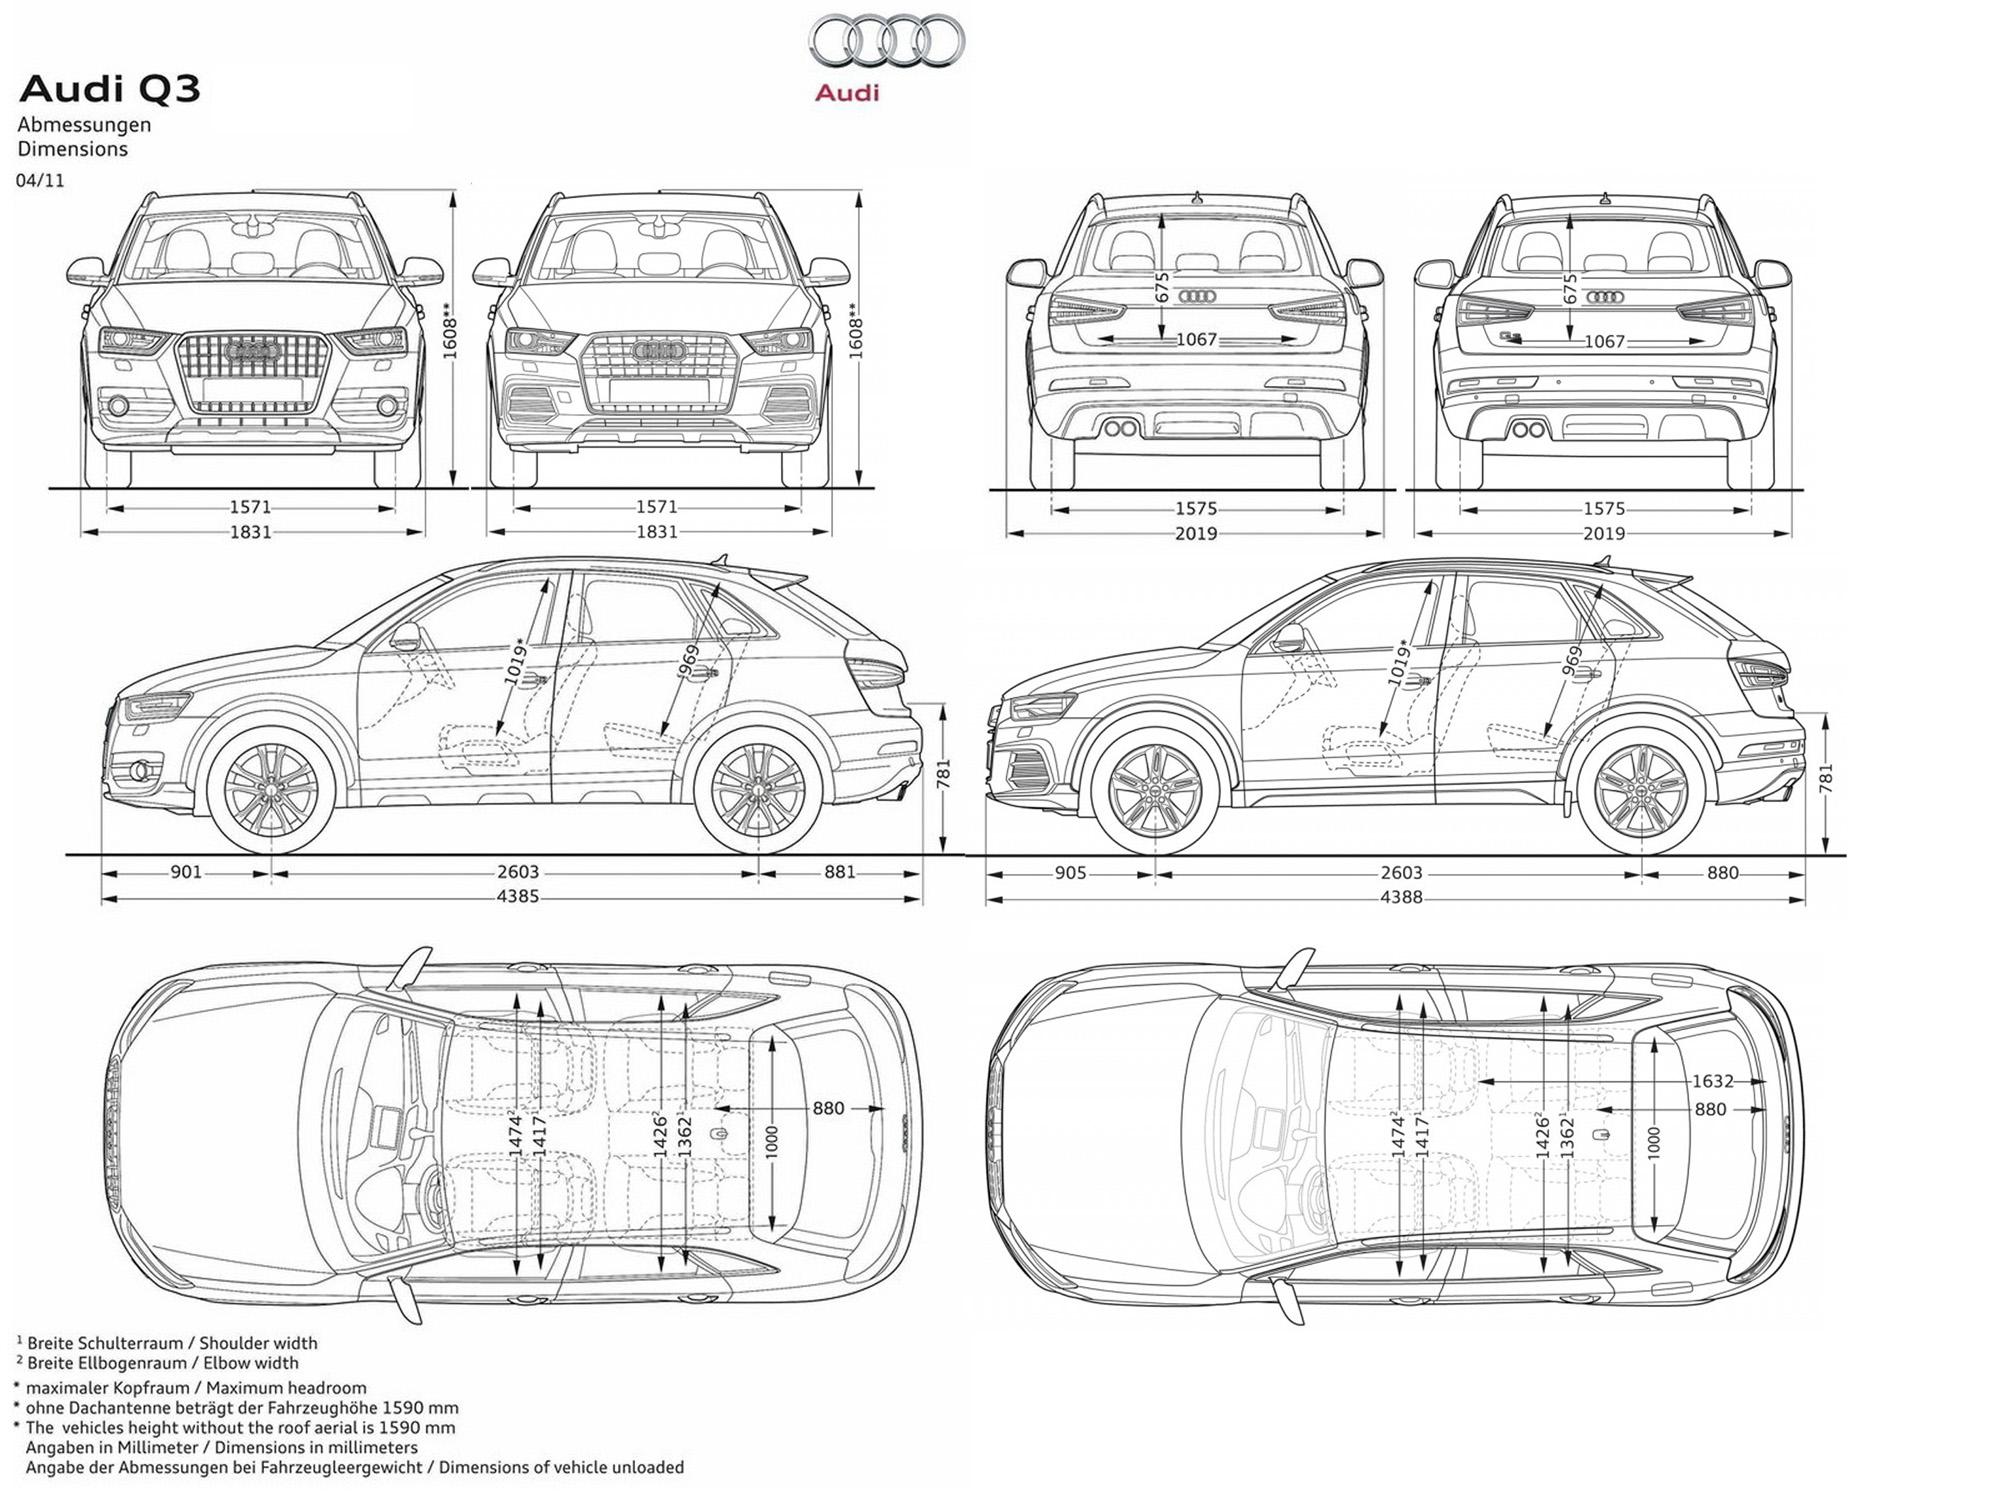 Abmessungen Q3 Facelift Q3 Facelift Audi Q3 207639699